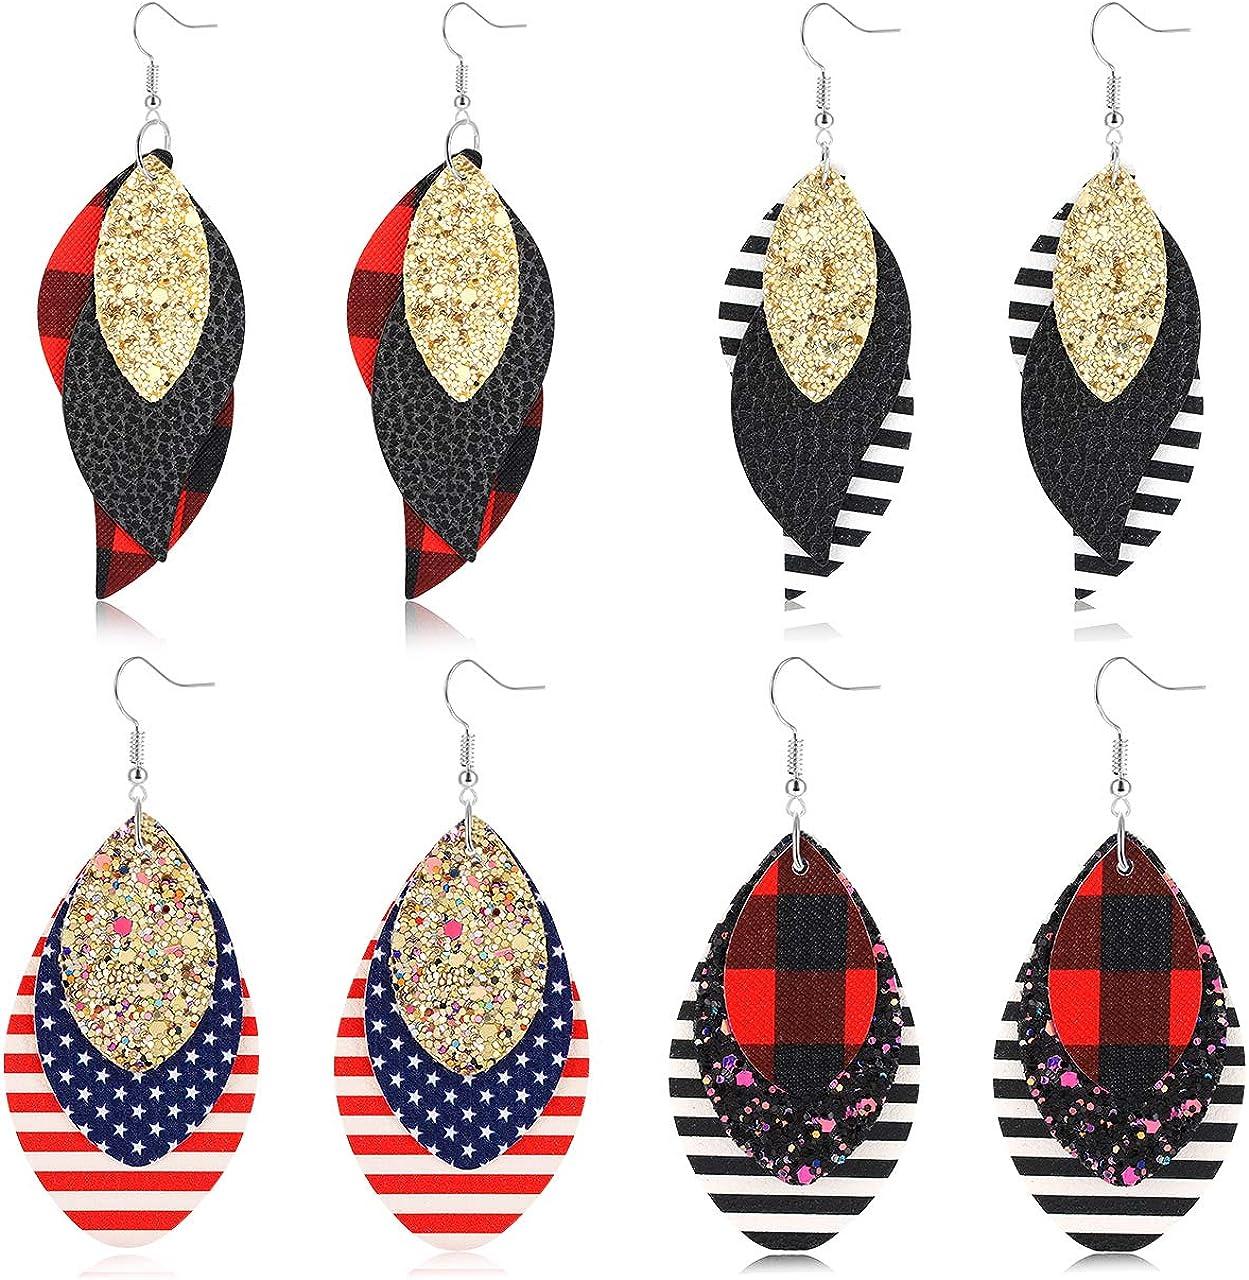 Drop Earrings Red and Black Earrings Round Earrings Leather Dangle Earrings Circle Earrings